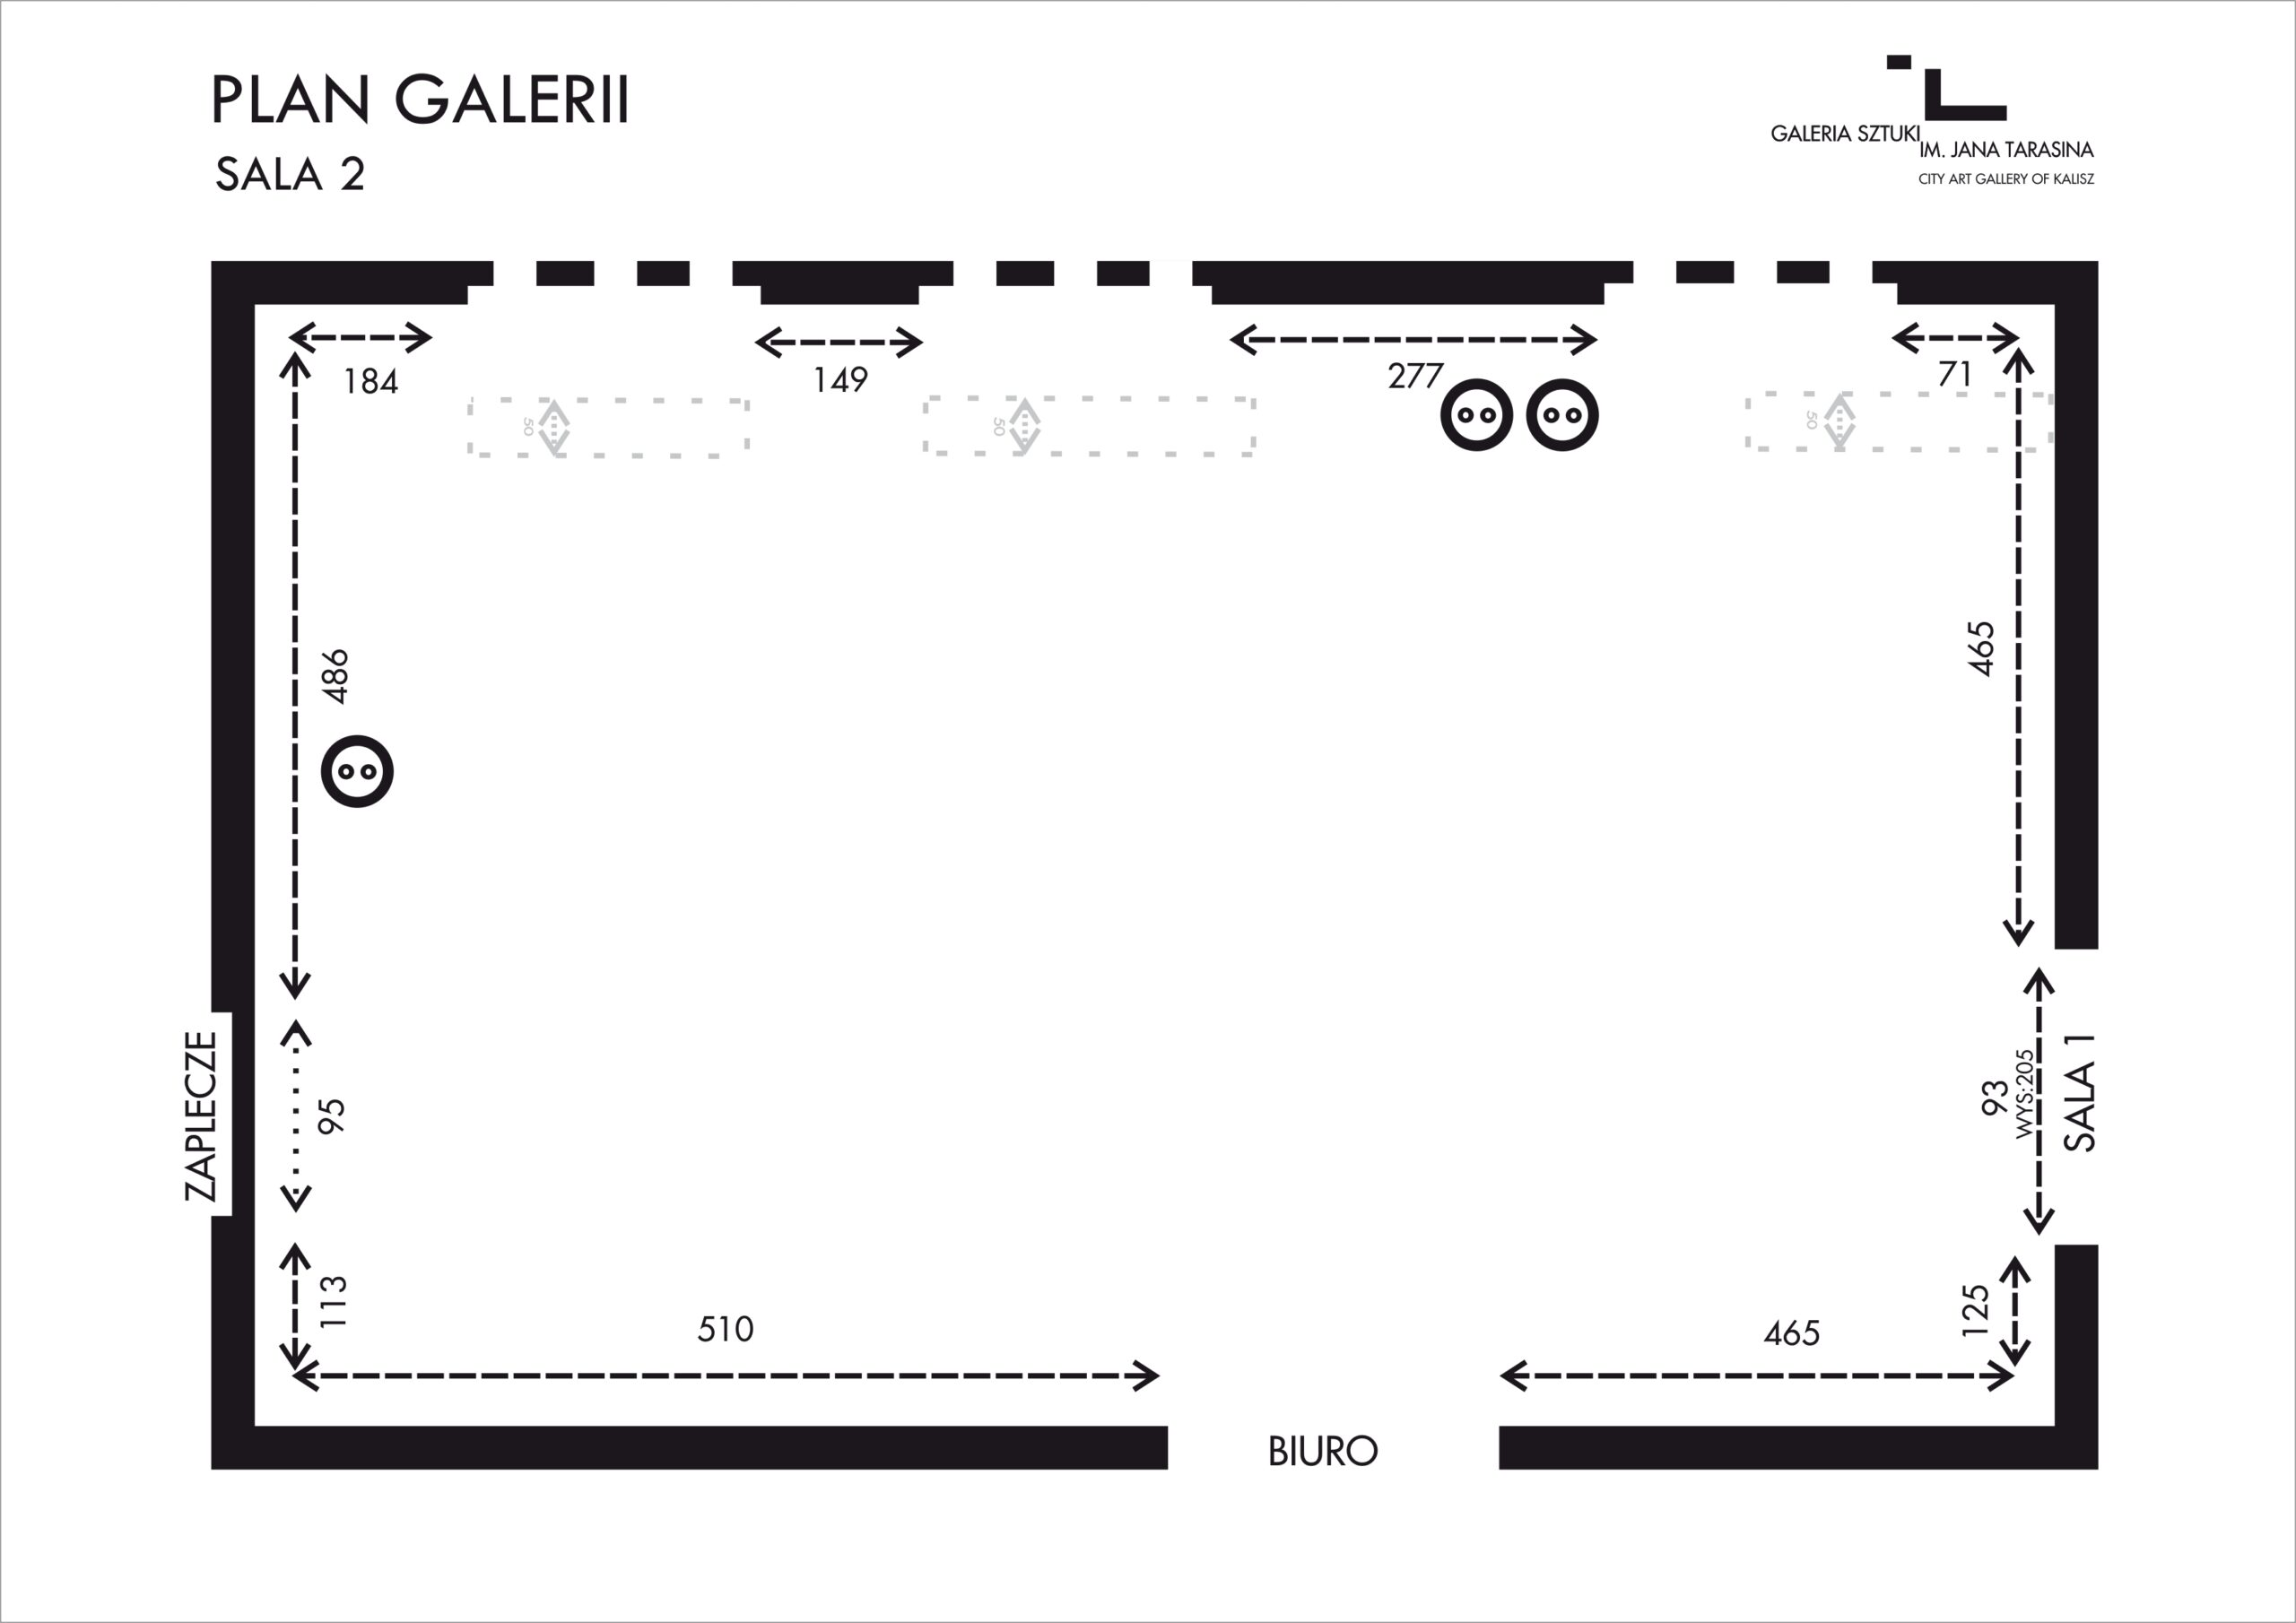 PLAN GALERII SALA 2